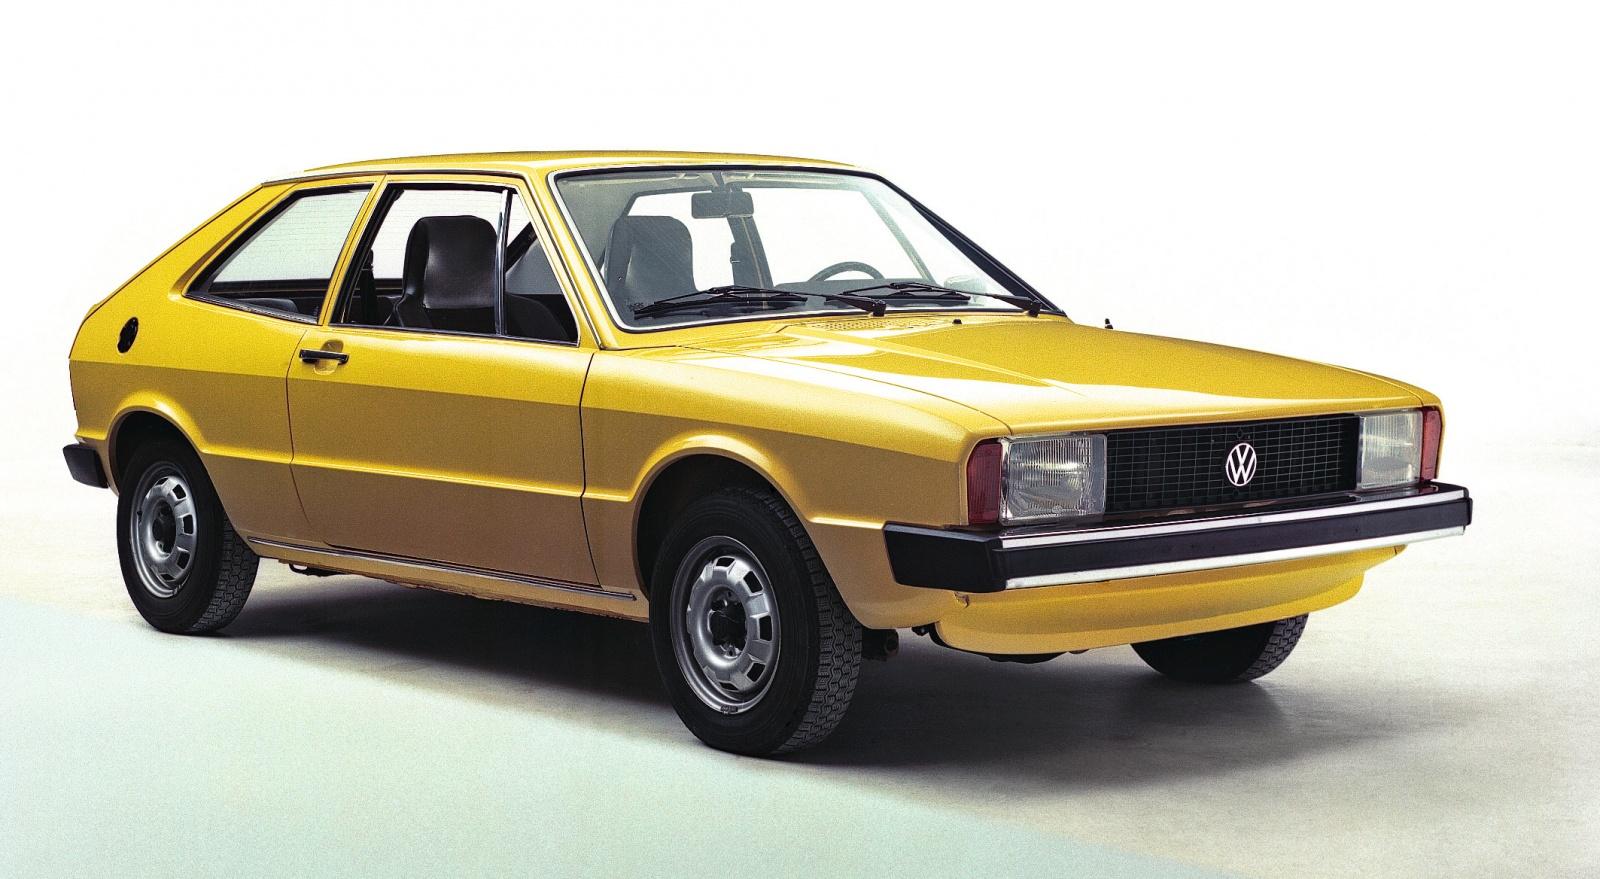 Volkswagen Scirocco I 1974 - 1981 Coupe #5